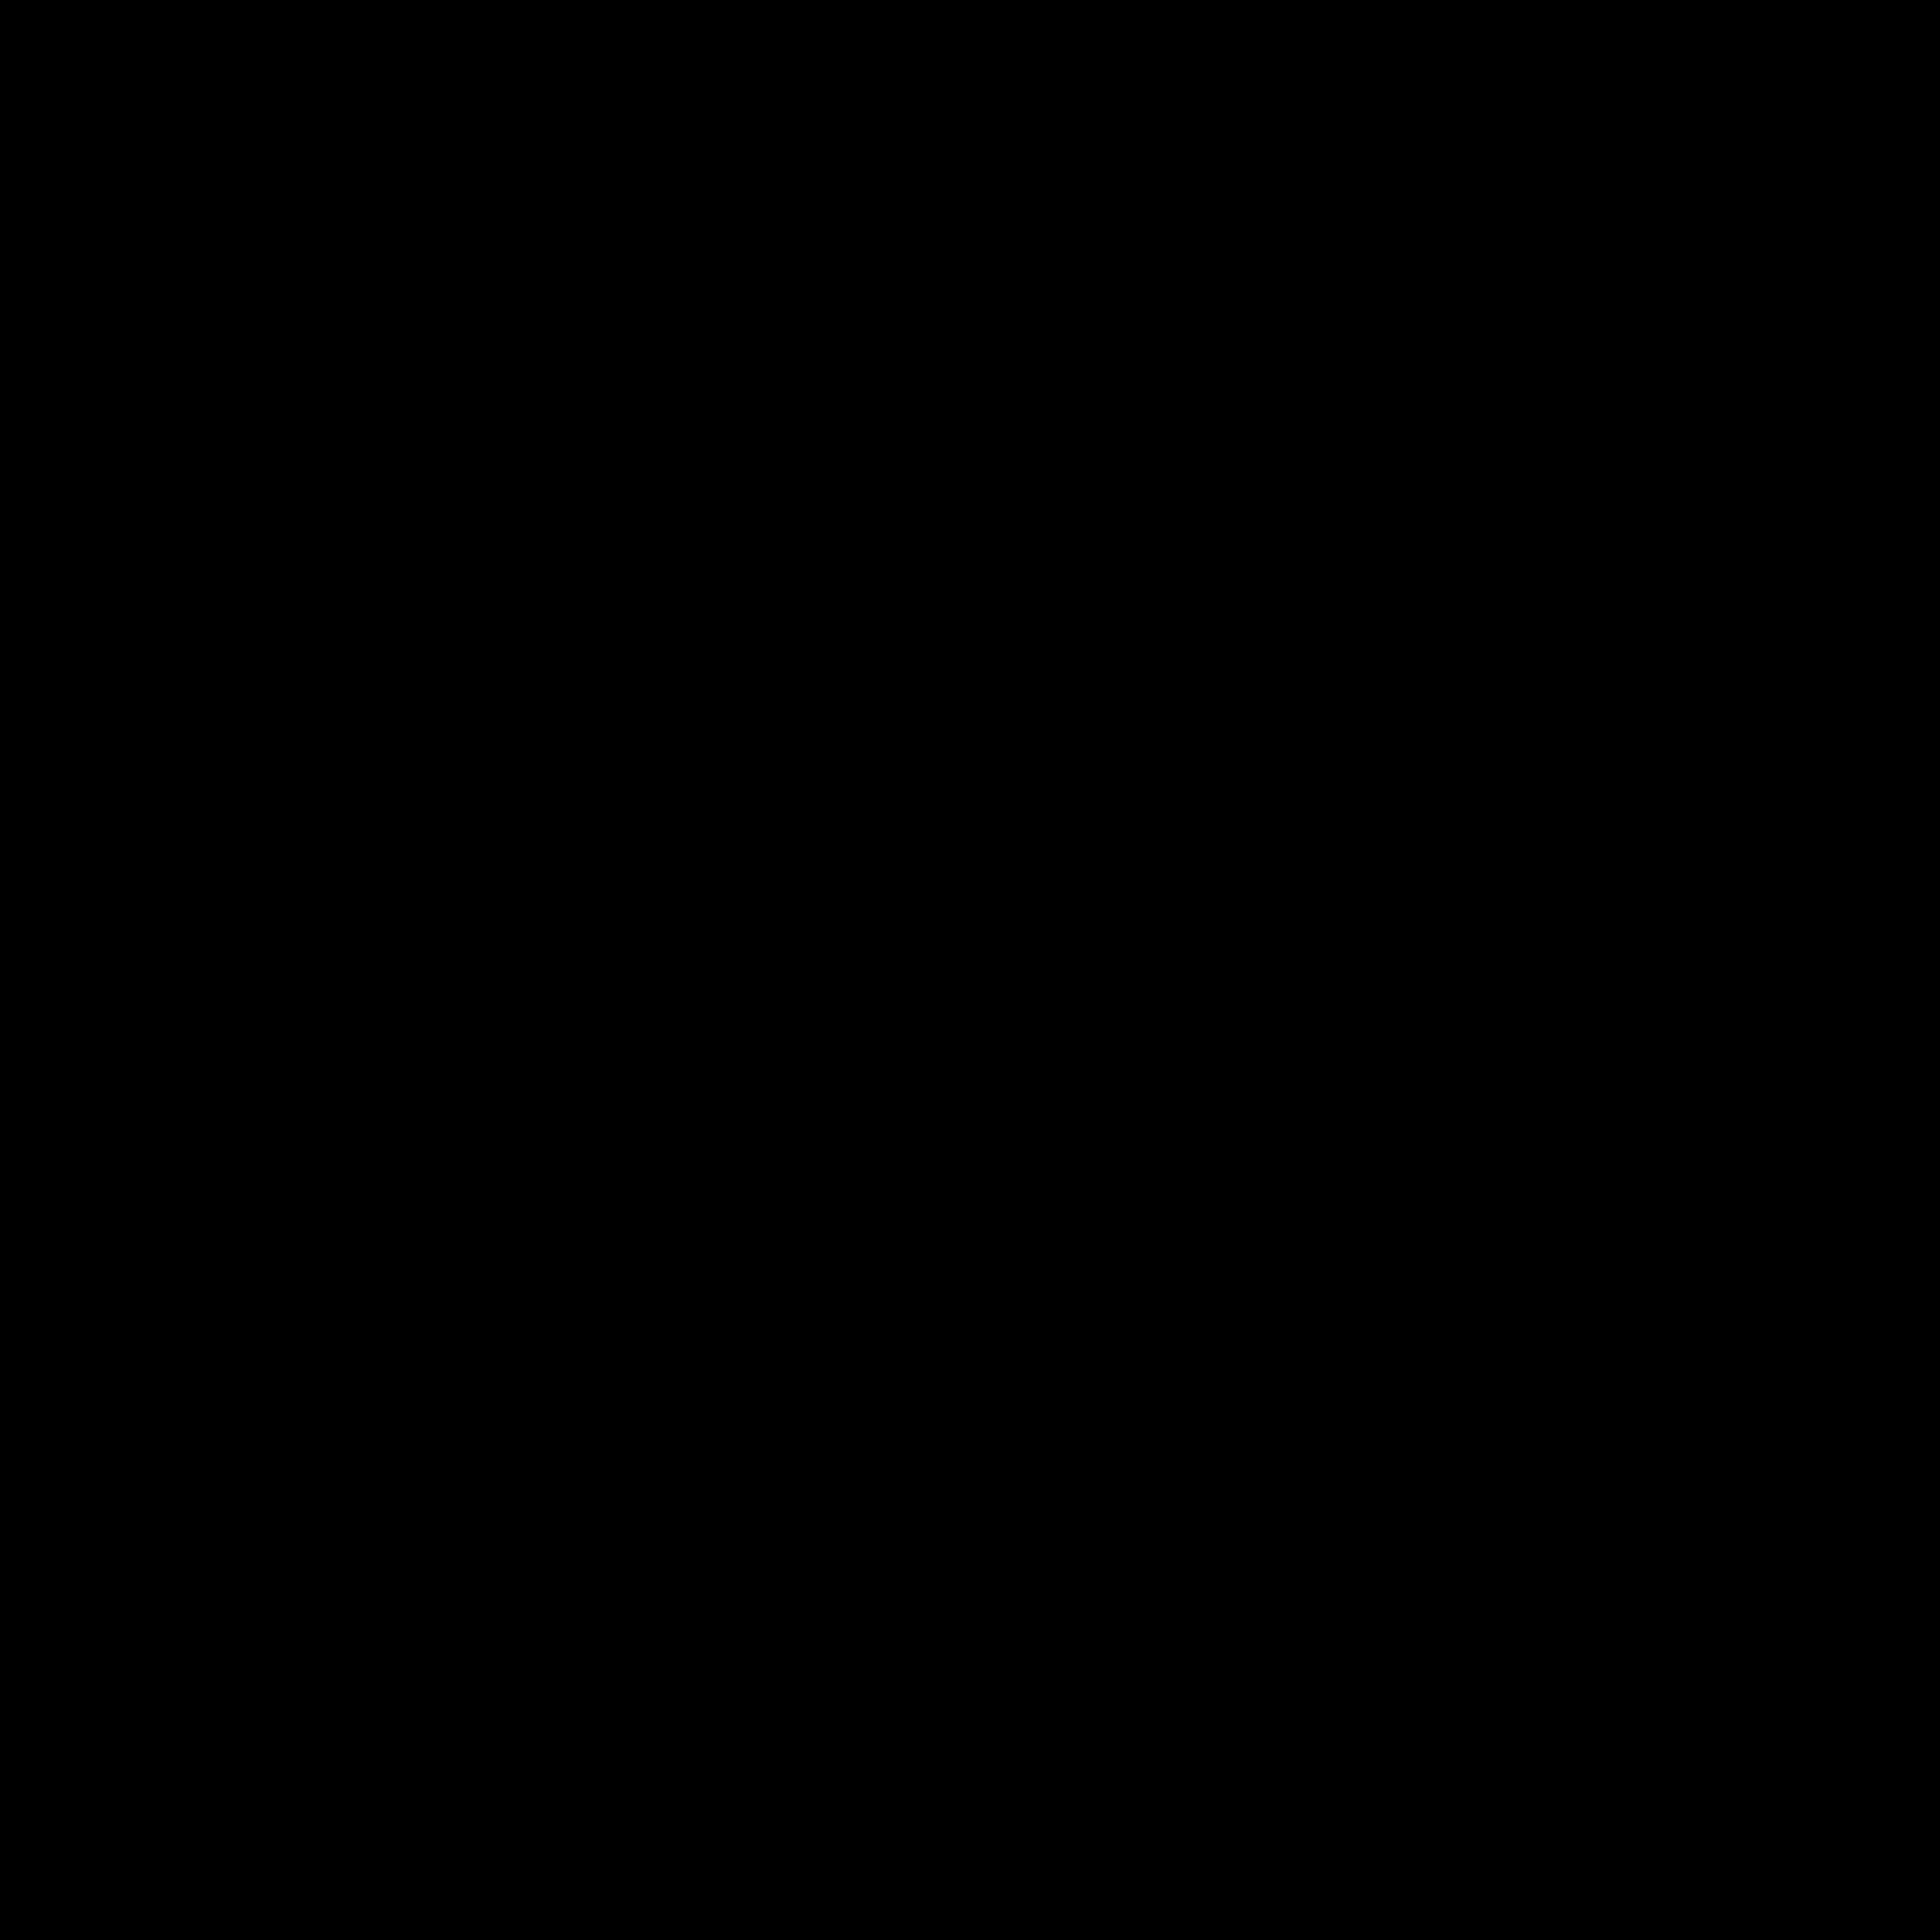 Laws legal symbol